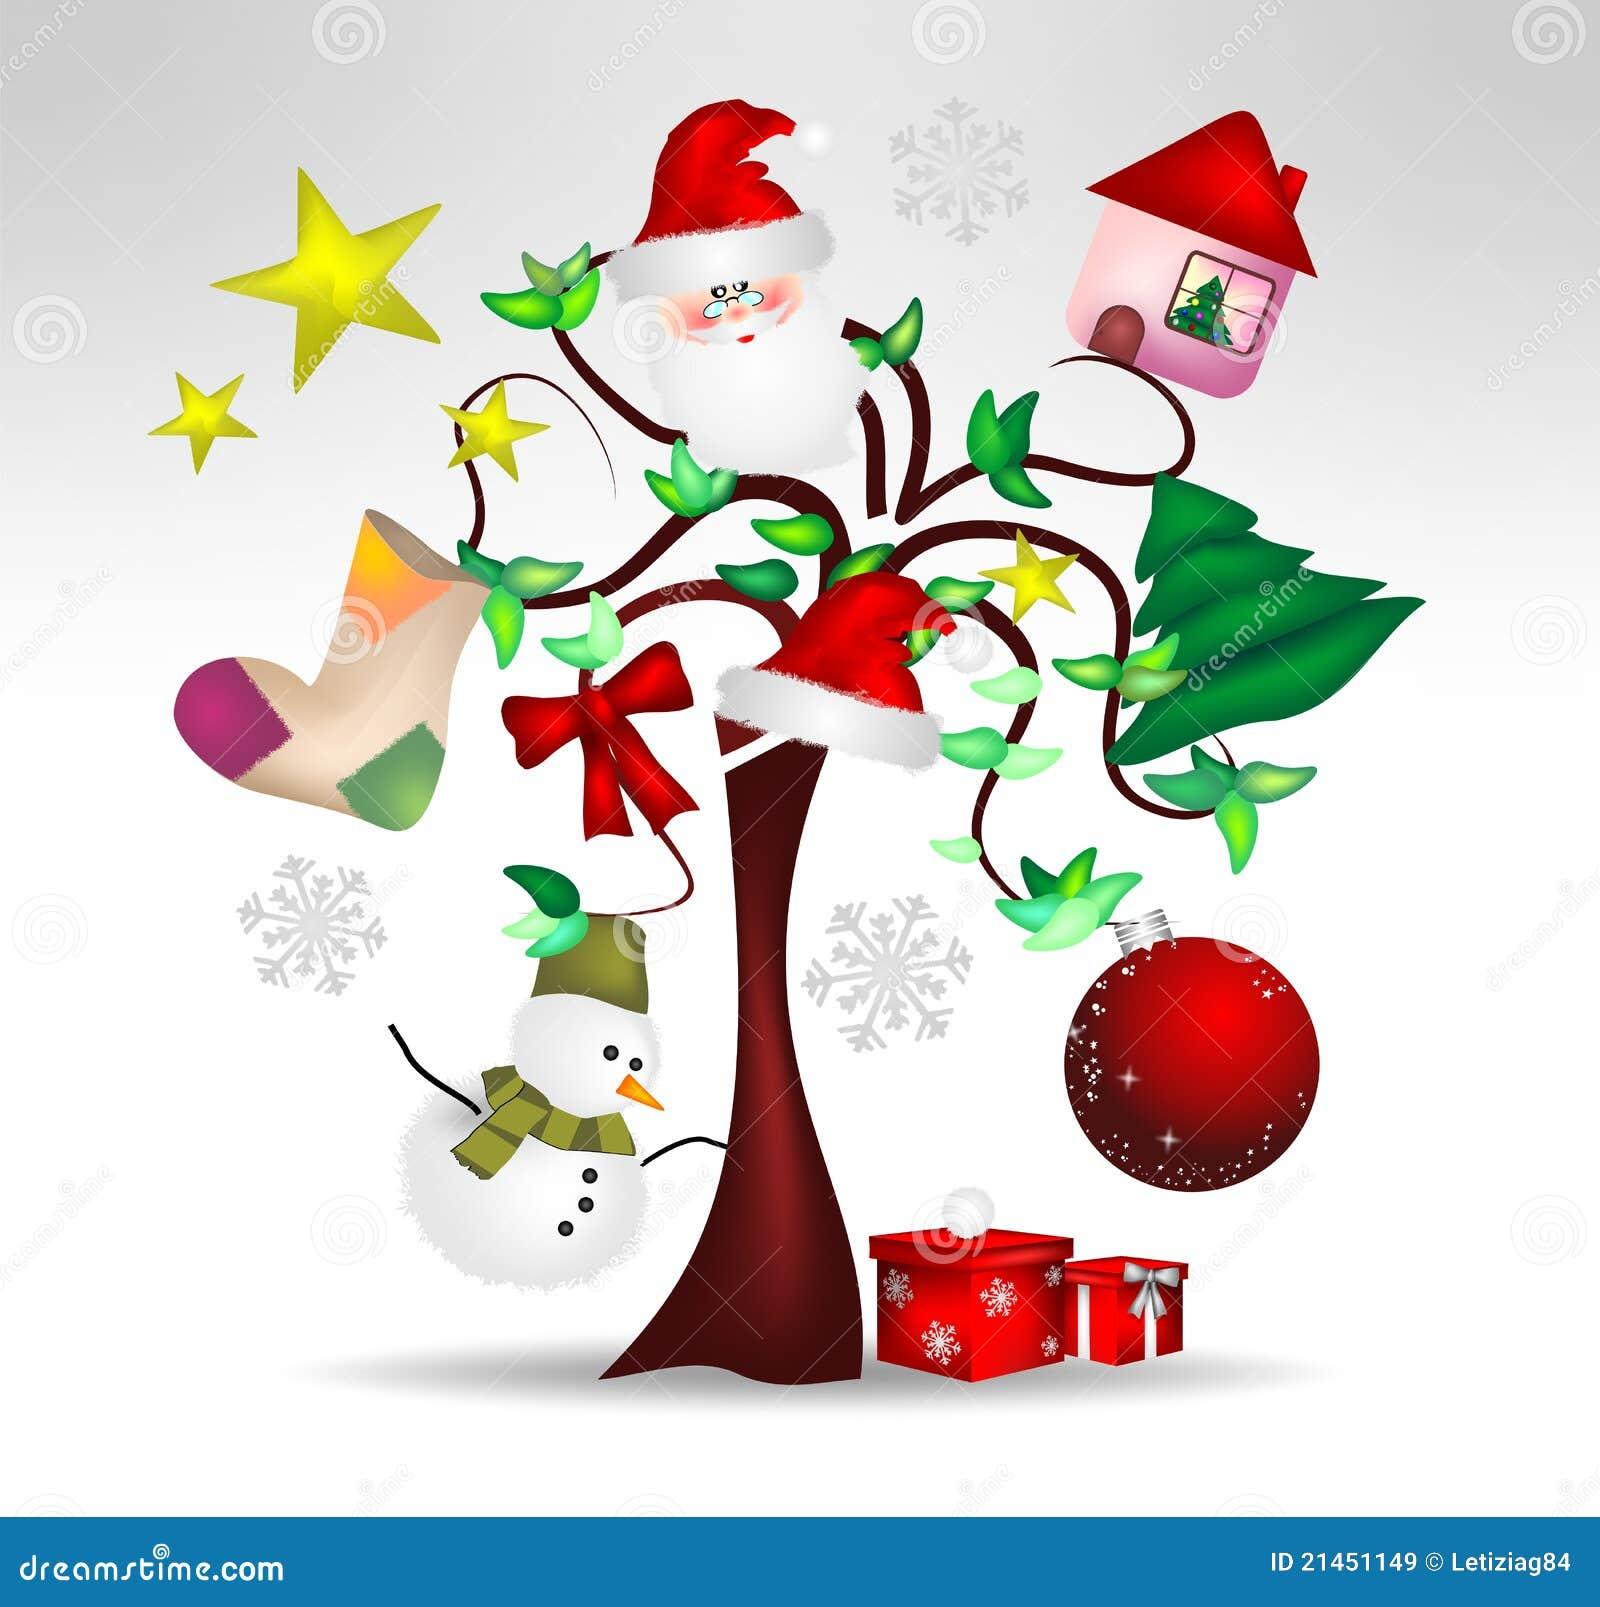 Original Christmas Decorations Royalty Free Stock Image